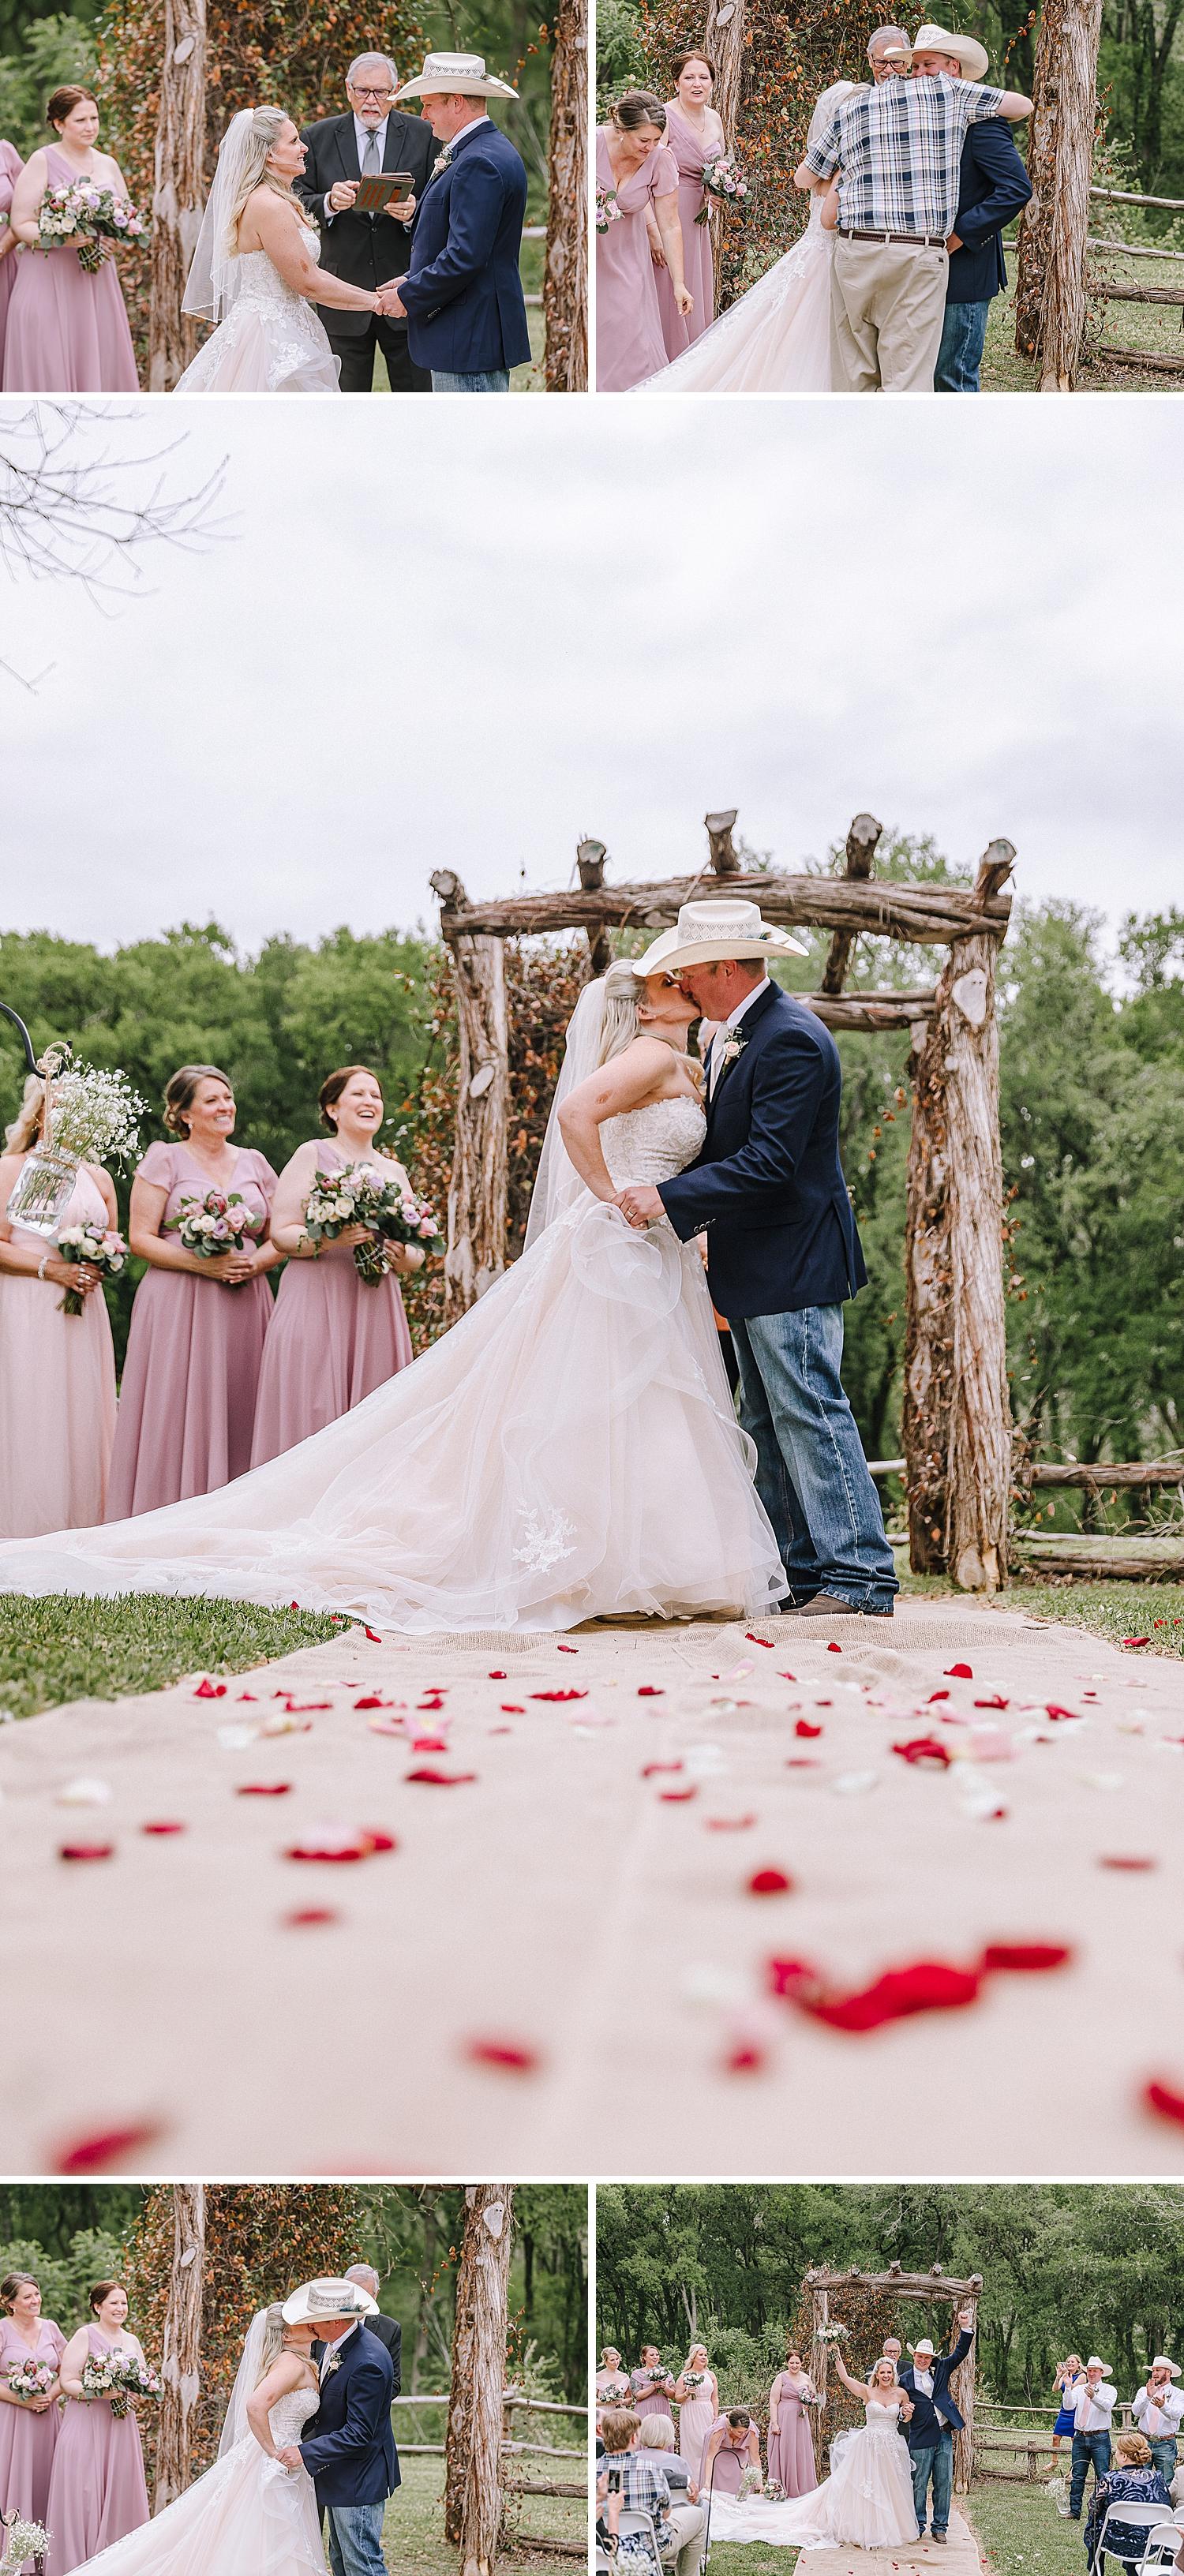 Rio-Cibilo-Ranch-Marion-Texas-Wedding-Rustic-Blush-Rose-Quartz-Details-Carly-Barton-Photography_0035.jpg